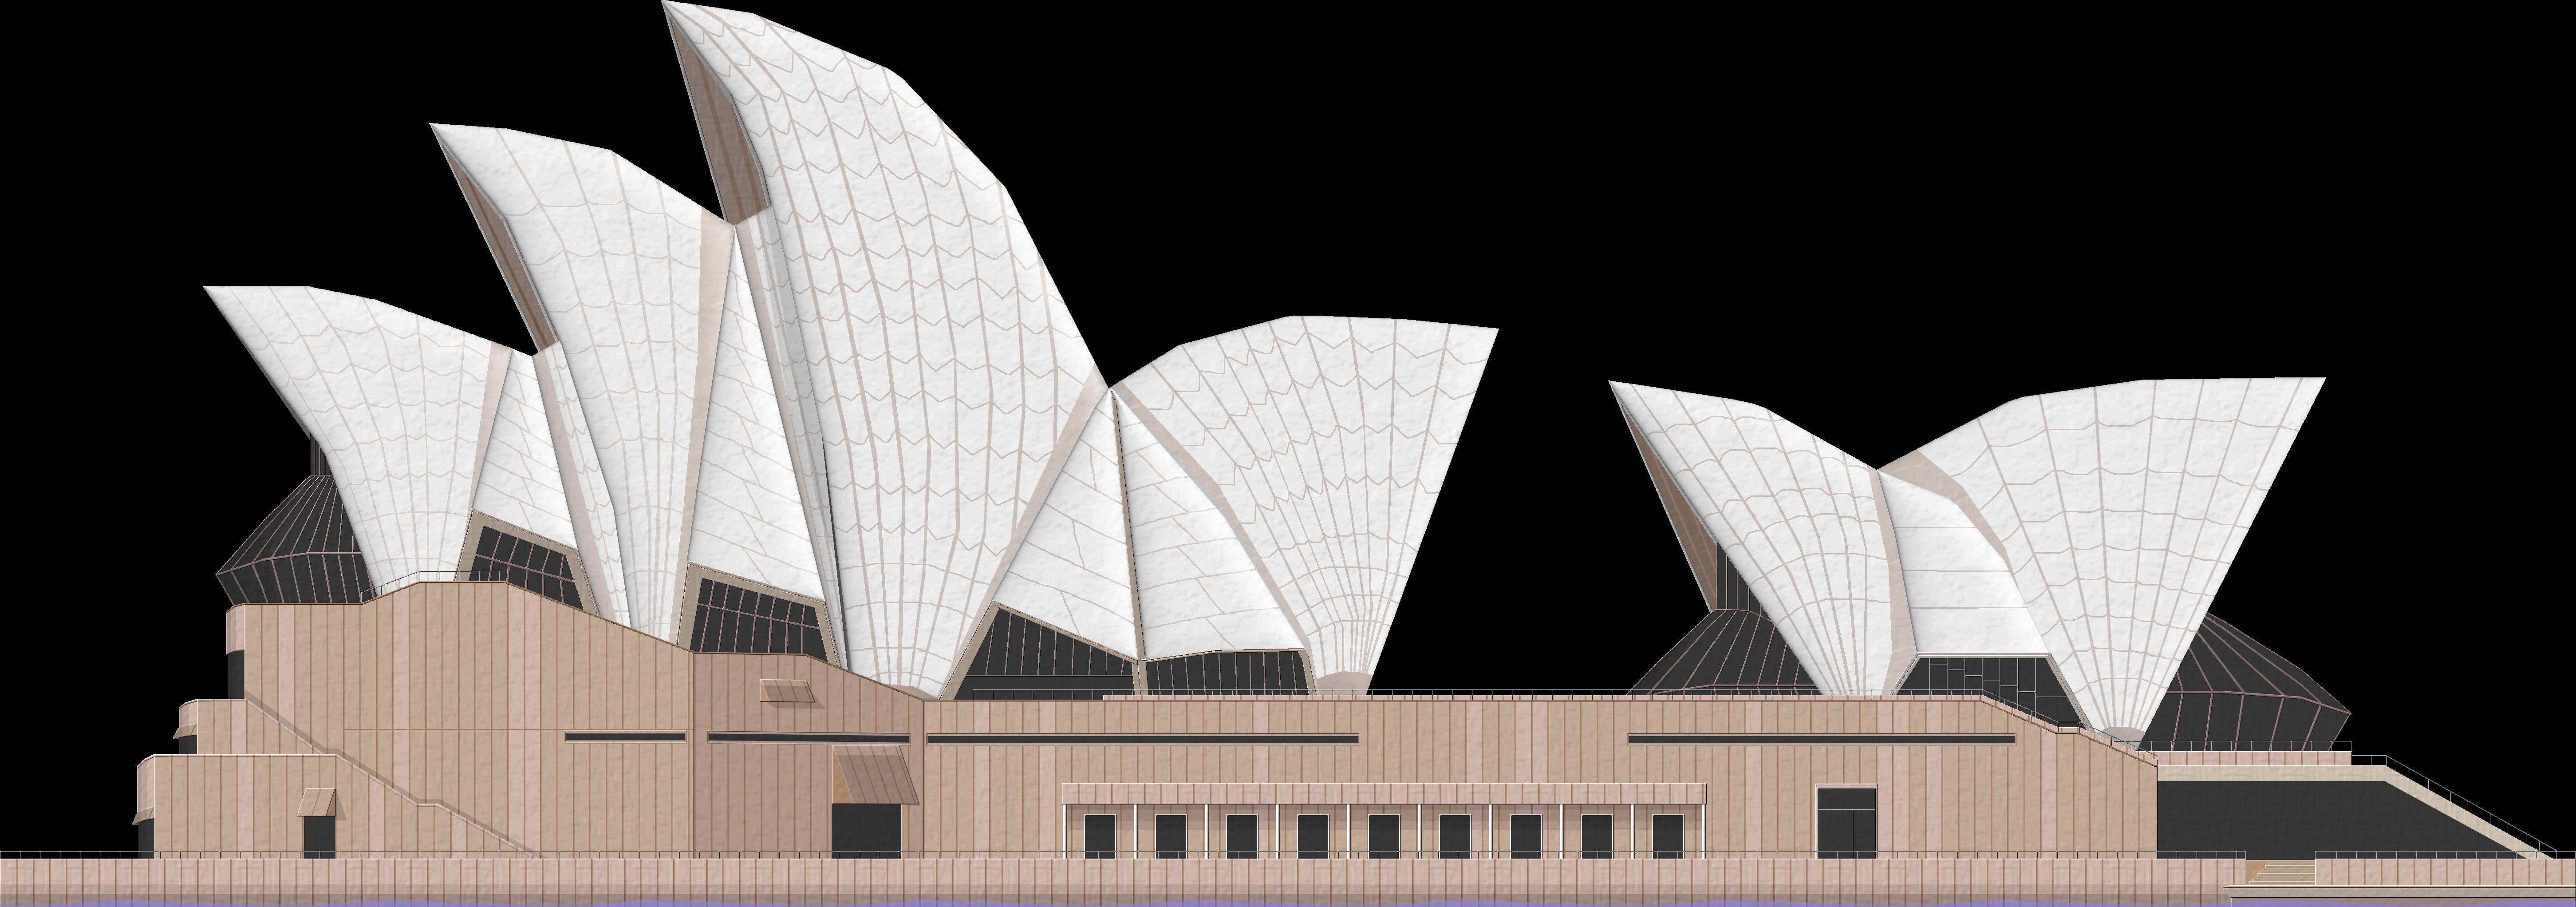 Sydney Opera House Png File - Sydney, Transparent background PNG HD thumbnail